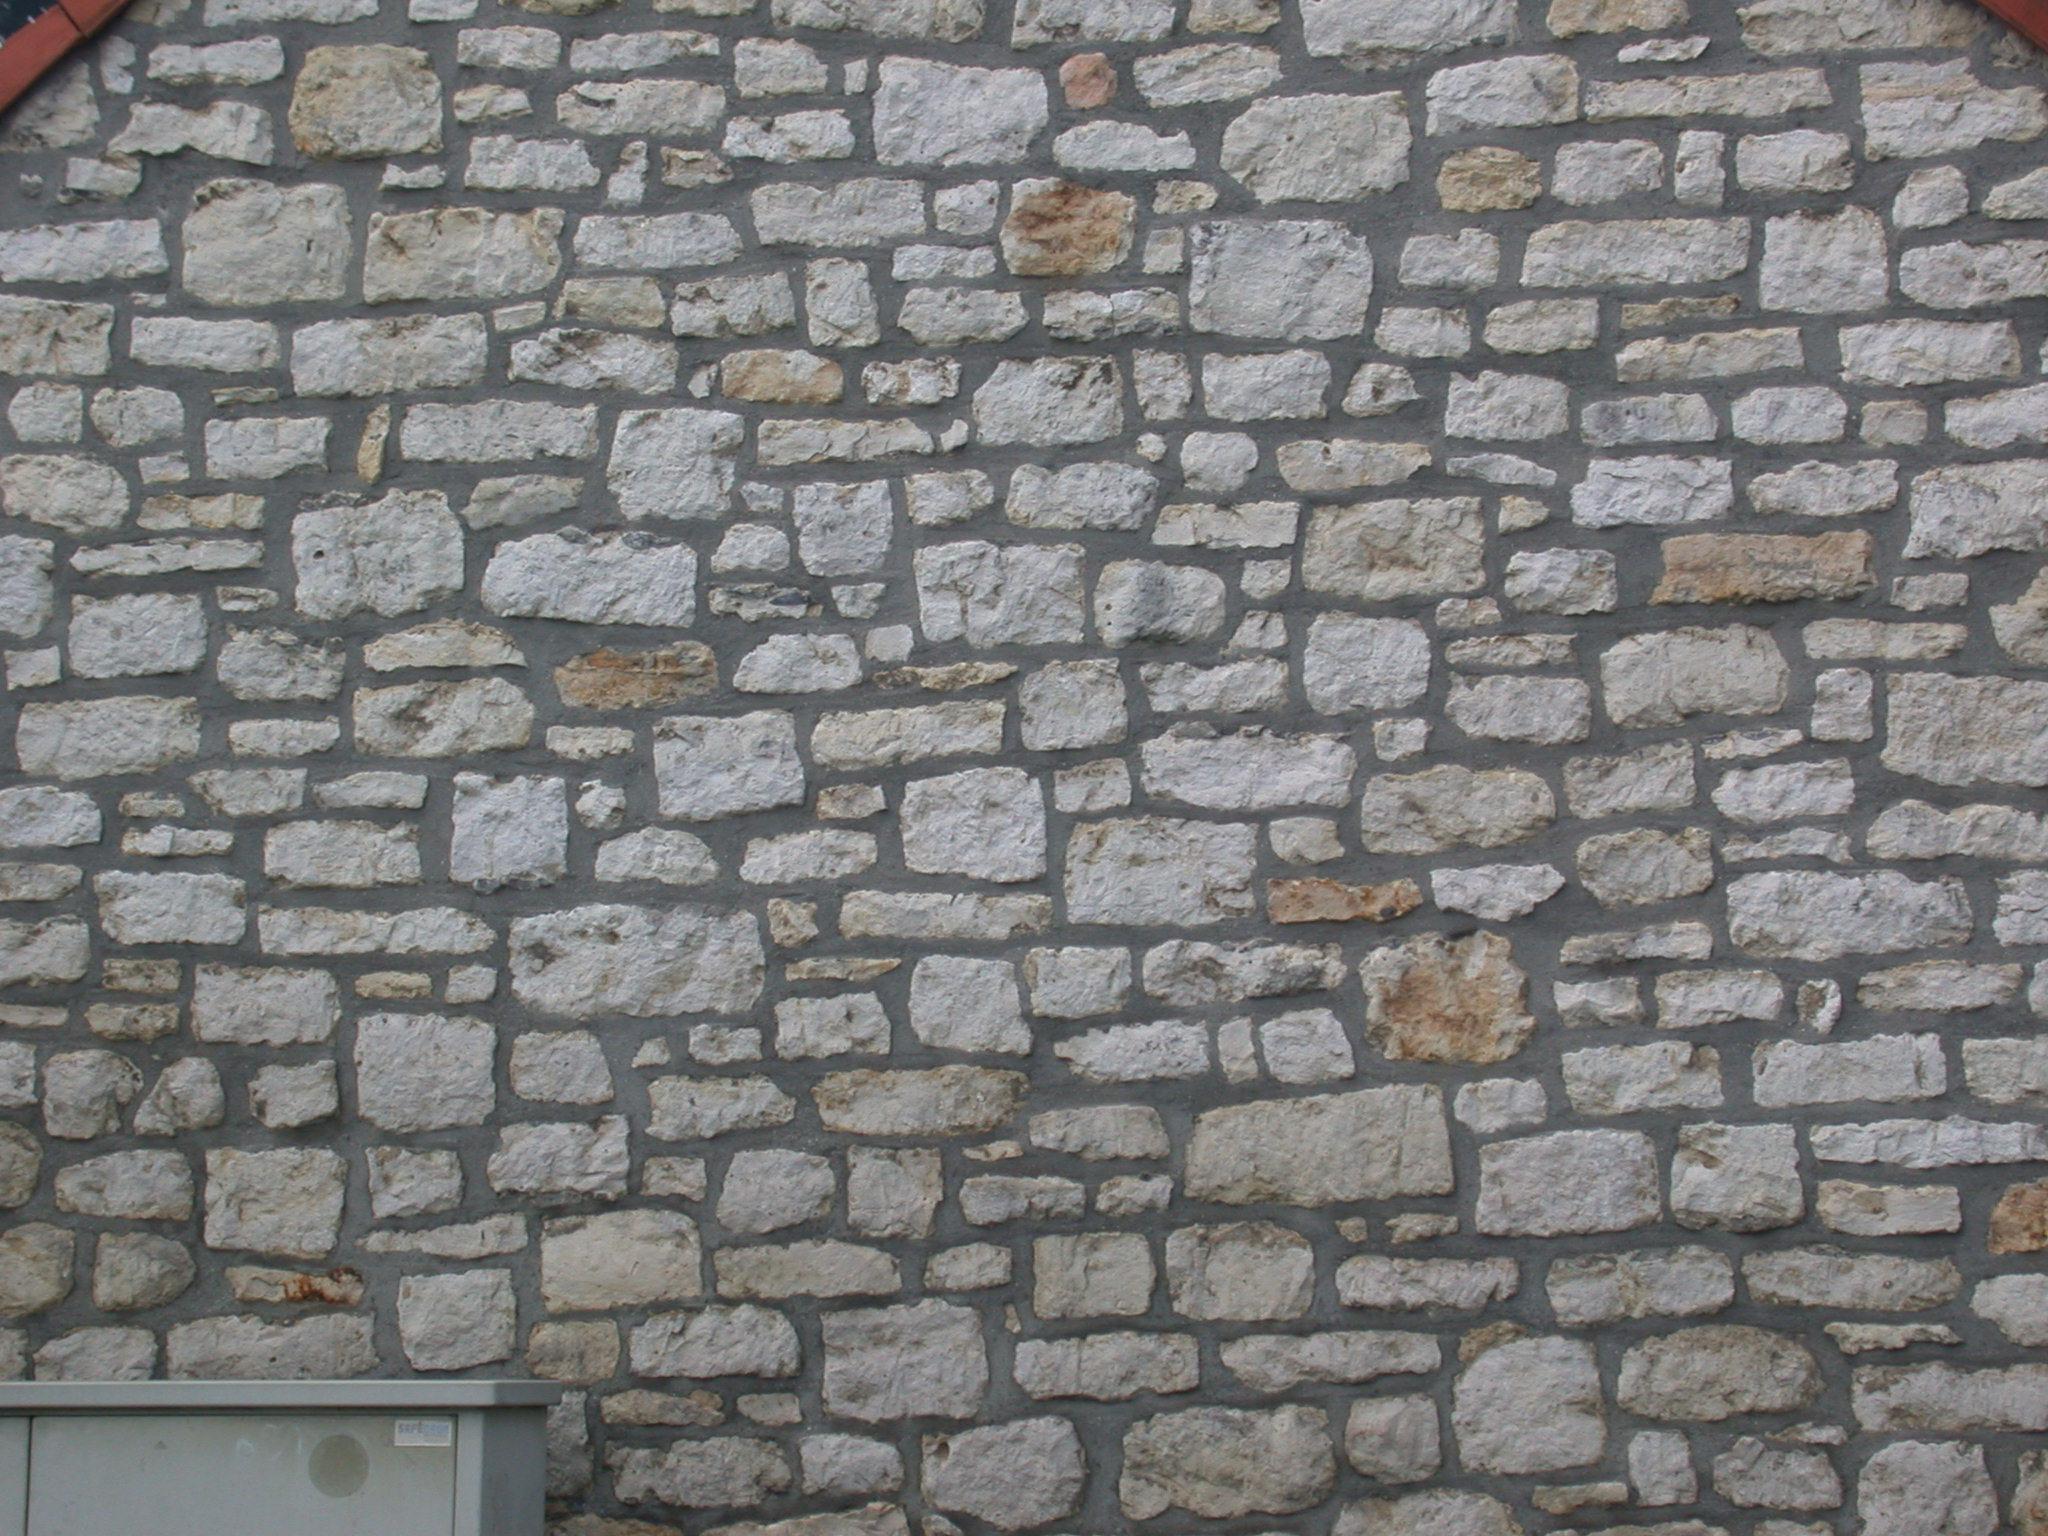 Stones Like Stones Essen image after texture castle like brick wall mortar stones